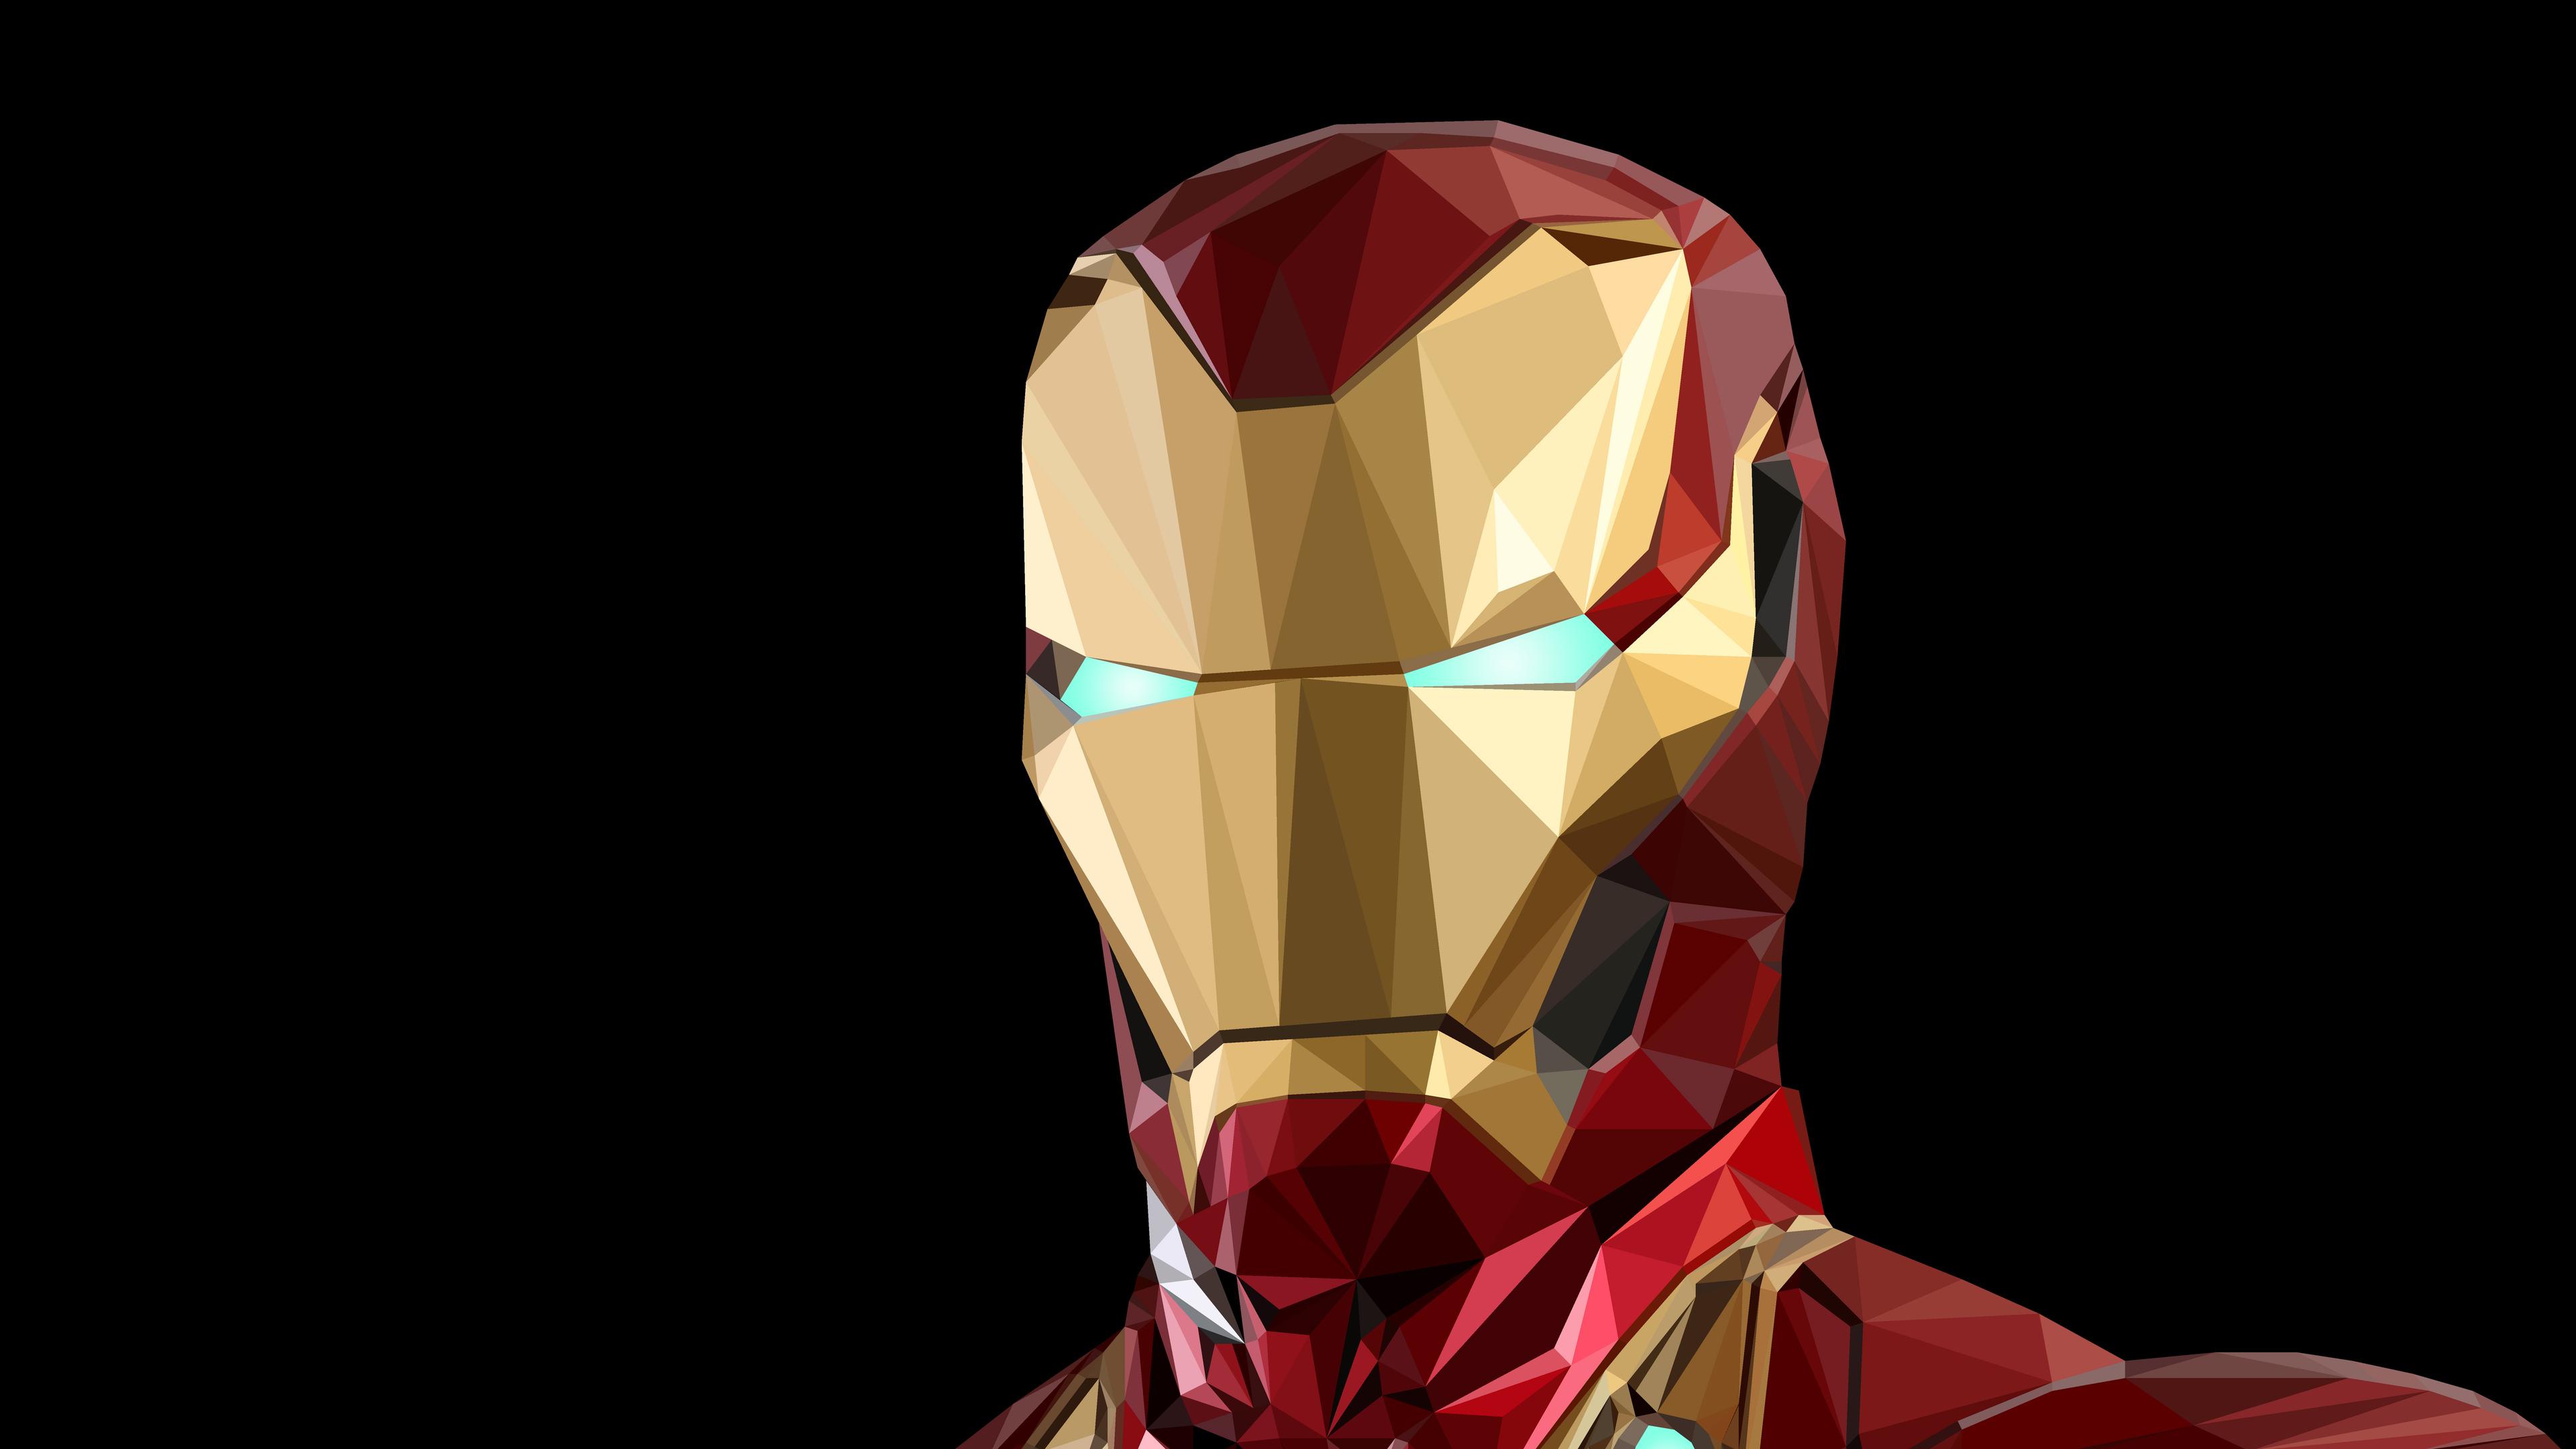 Wallpaper 4k Iron Man Oled 8k 4k Wallpapers 5k Wallpapers 8k